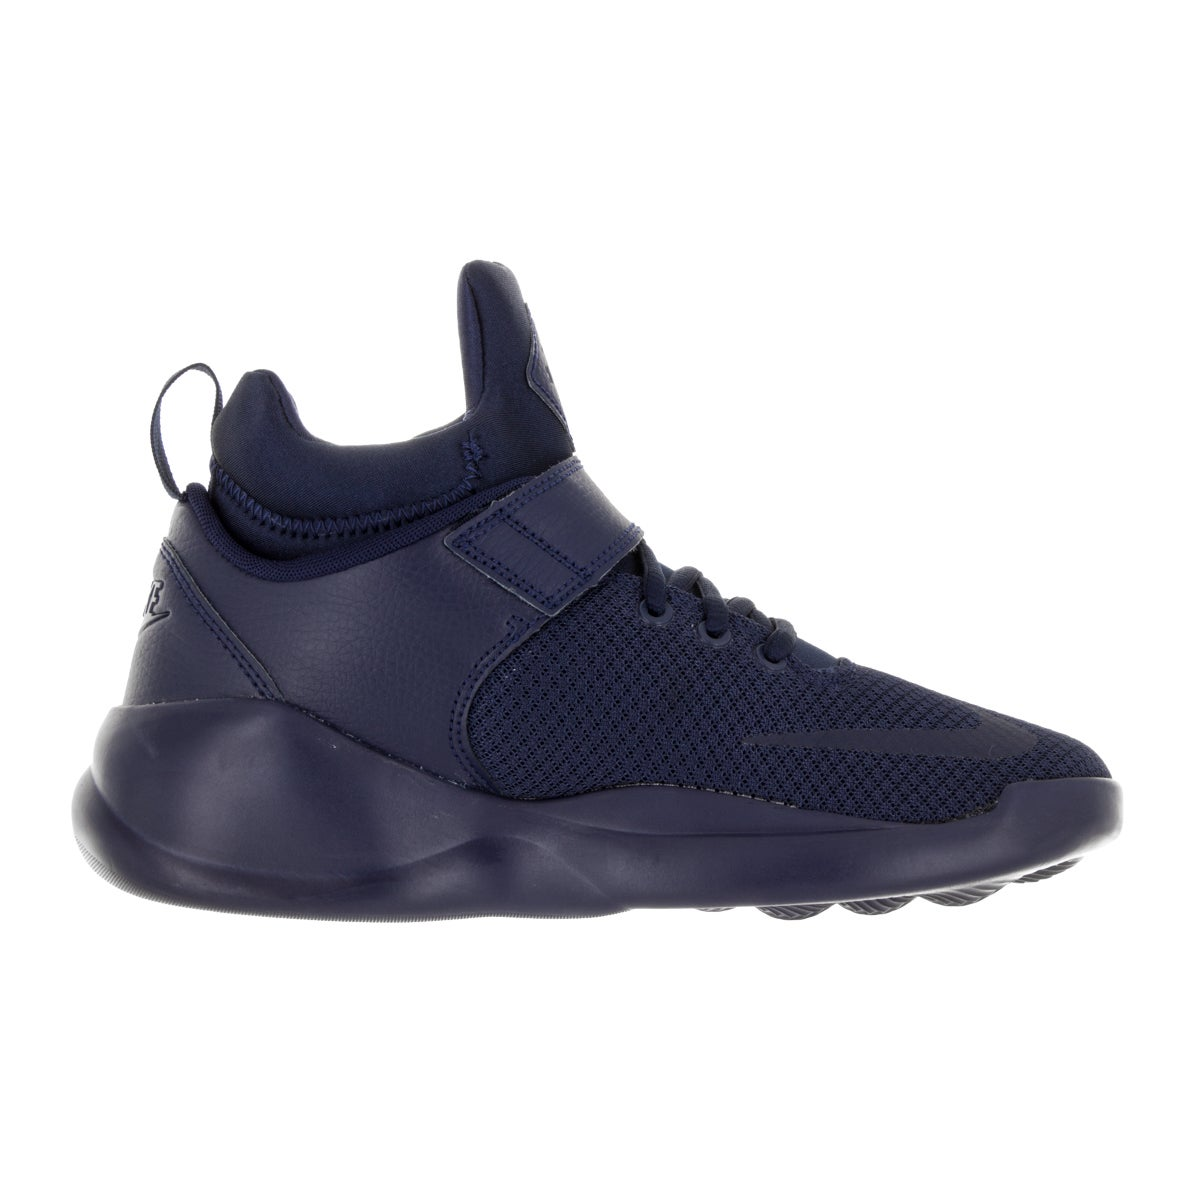 sports shoes aa7d4 585fd Shop Nike Kids  Kwazi (GS) Midnight Navy Basketball Shoe - Free Shipping  Today - Overstock.com - 13394194